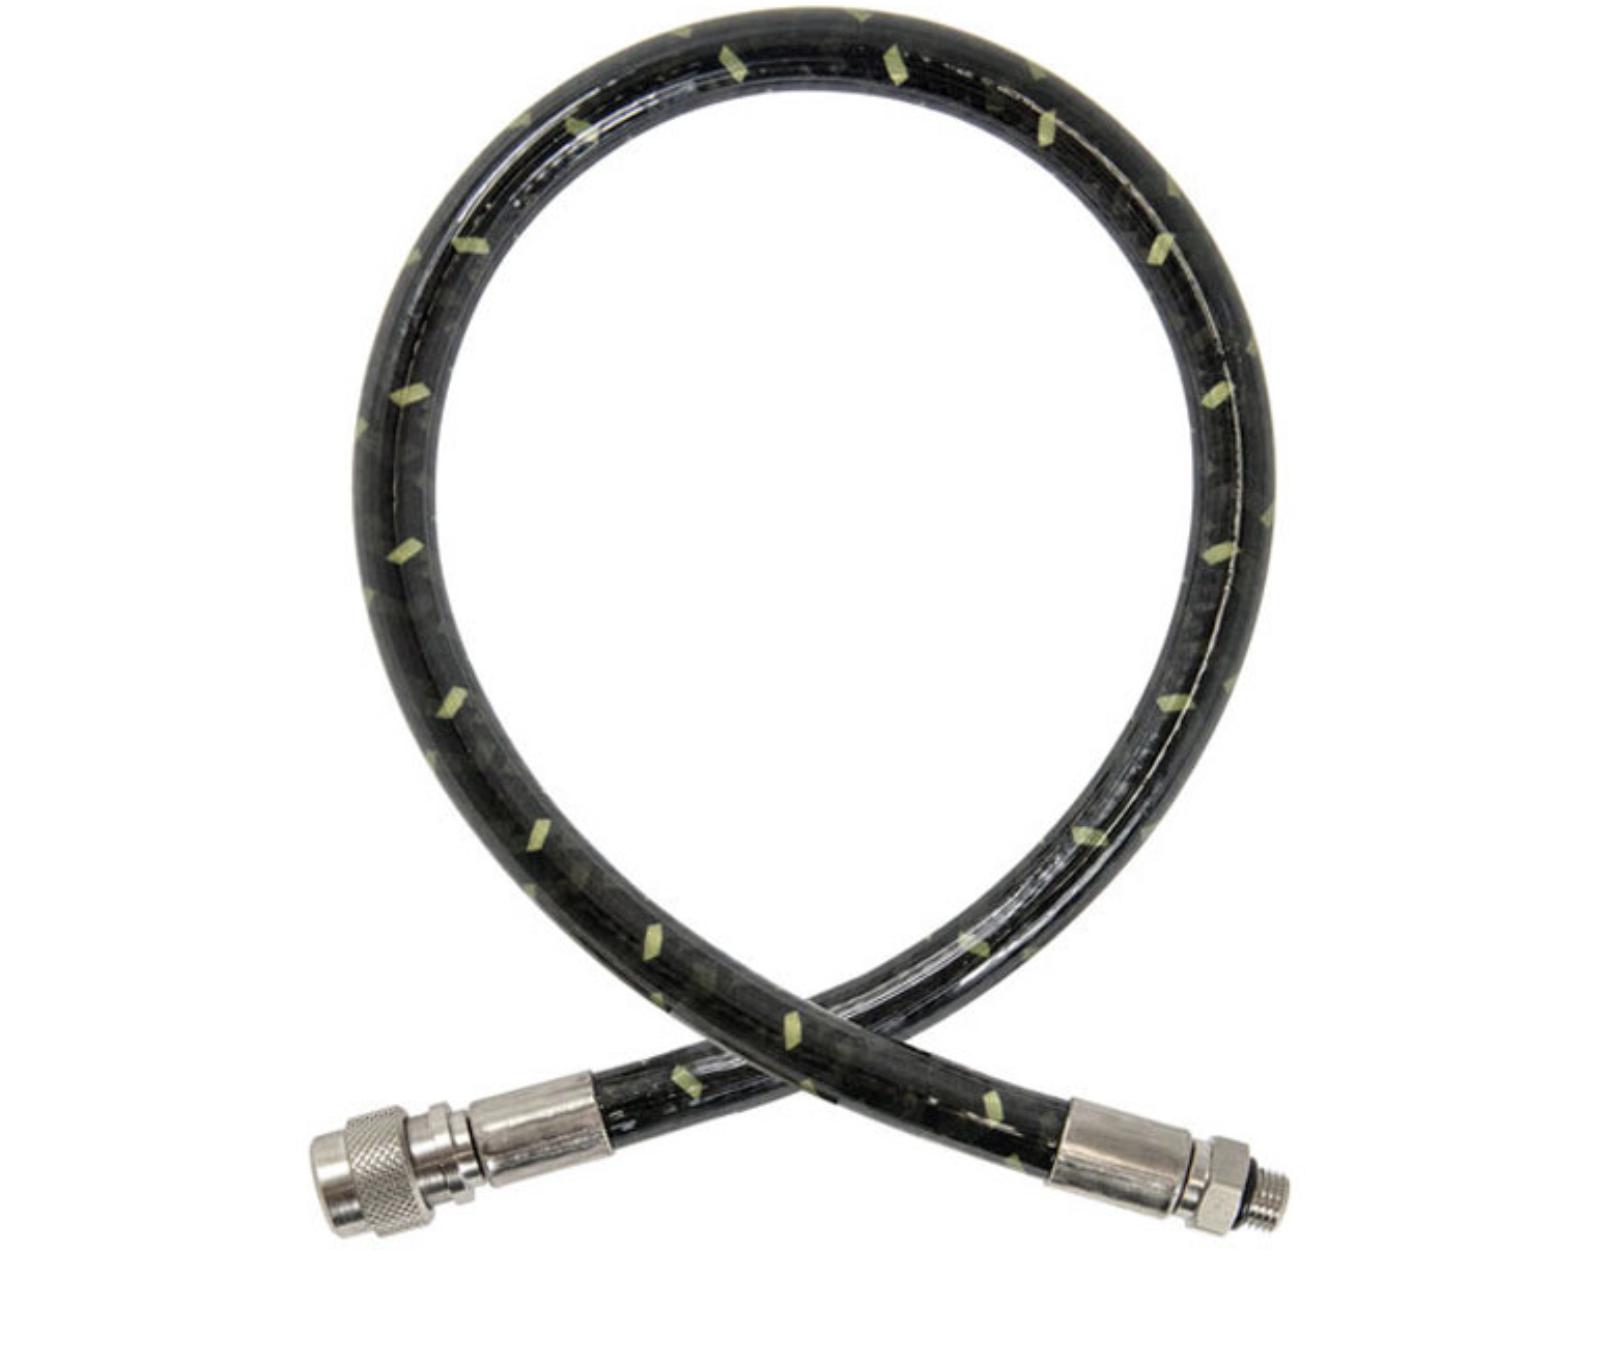 Miflex 22 XT-Tech QD Hose